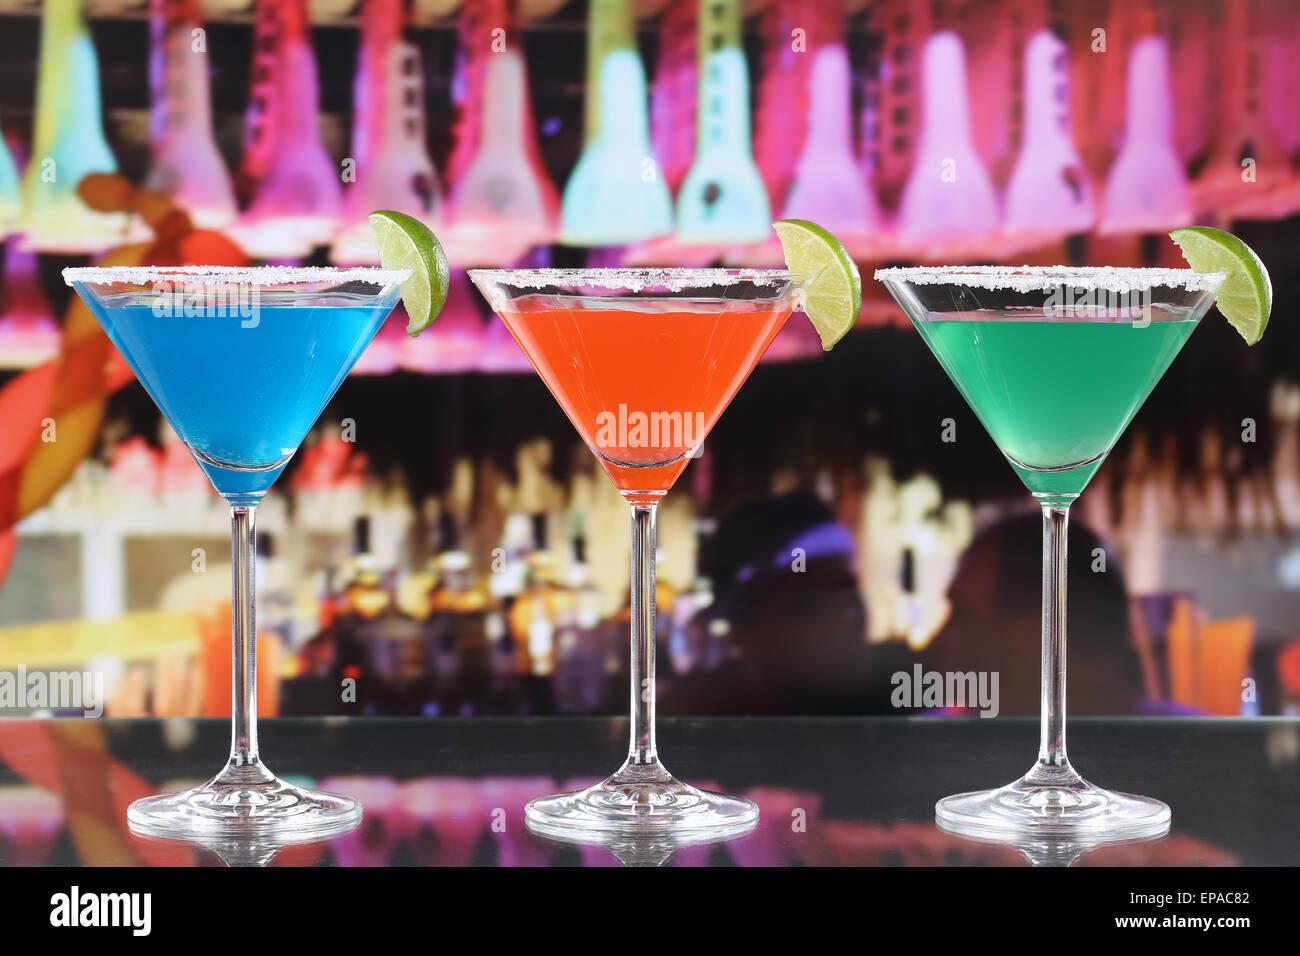 Bunte cocktail Martini in Gläsern in einer Bar Immagini Stock